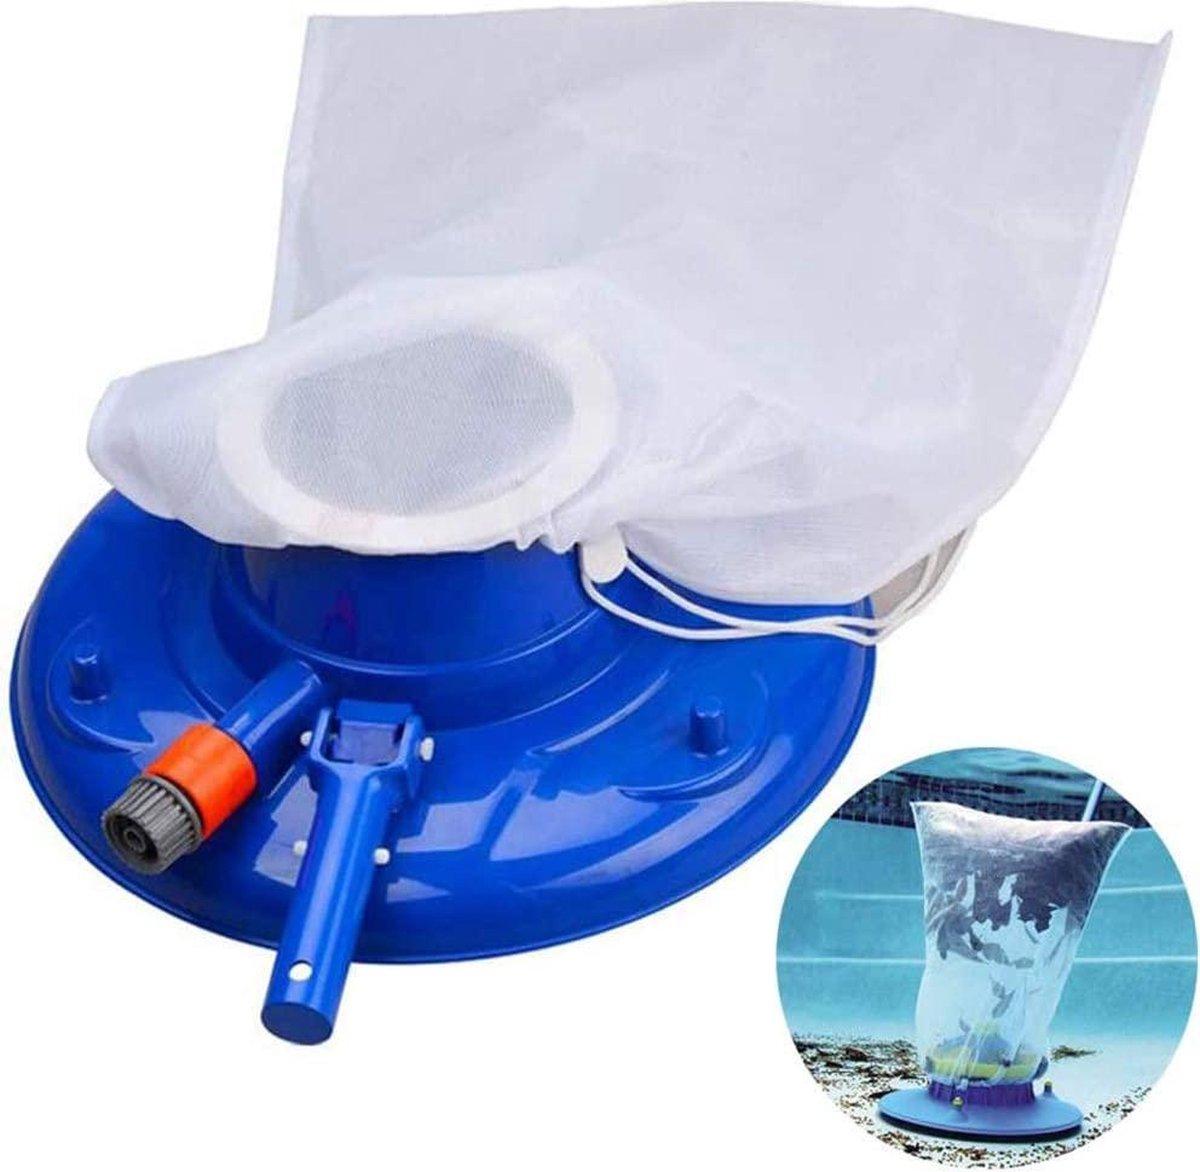 zwembadstofzuiger -civiky zwembad cleaner nozzles zwembad vacuüm cleaner vacuüm hoofd zwembad schoonmakende vloer cleaner basis zwembad handige zuigkop met snelle reiniging blauw - (WK 02123)